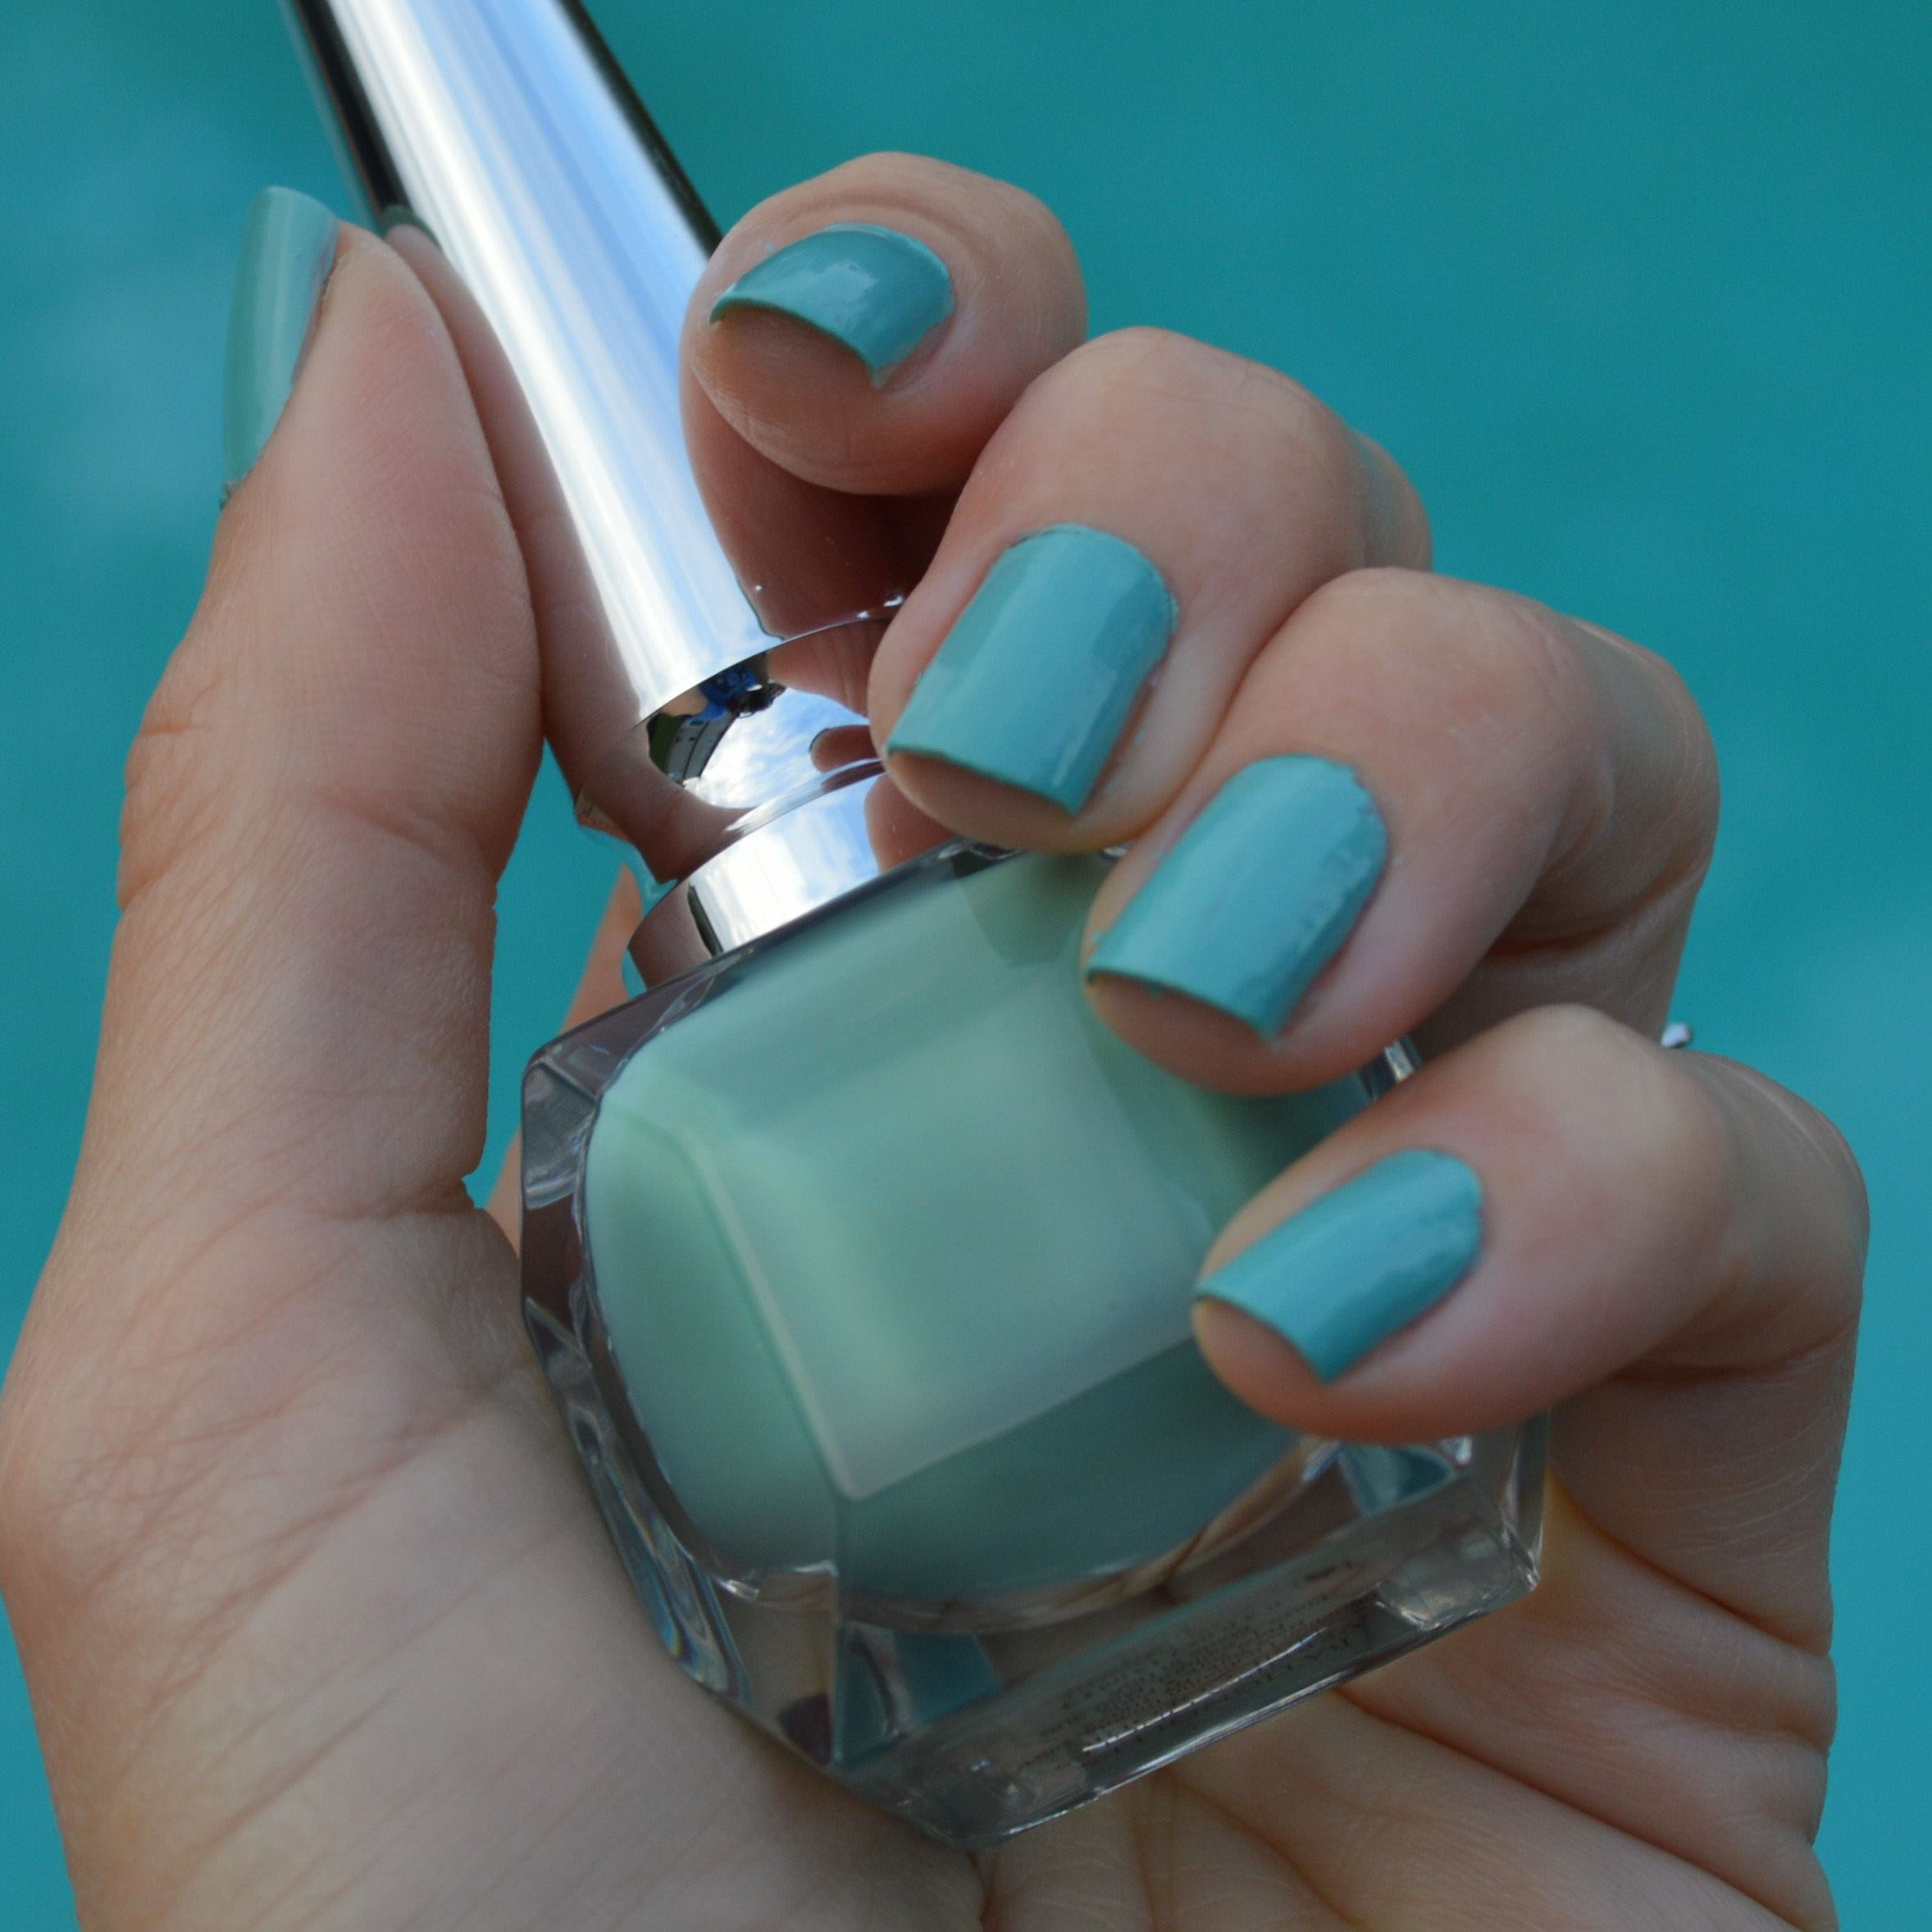 7ad593cce5c6 ... Bay Area Fashionista · christian louboutin batignolles nail polish  review · christian louboutin batignolles nail polish